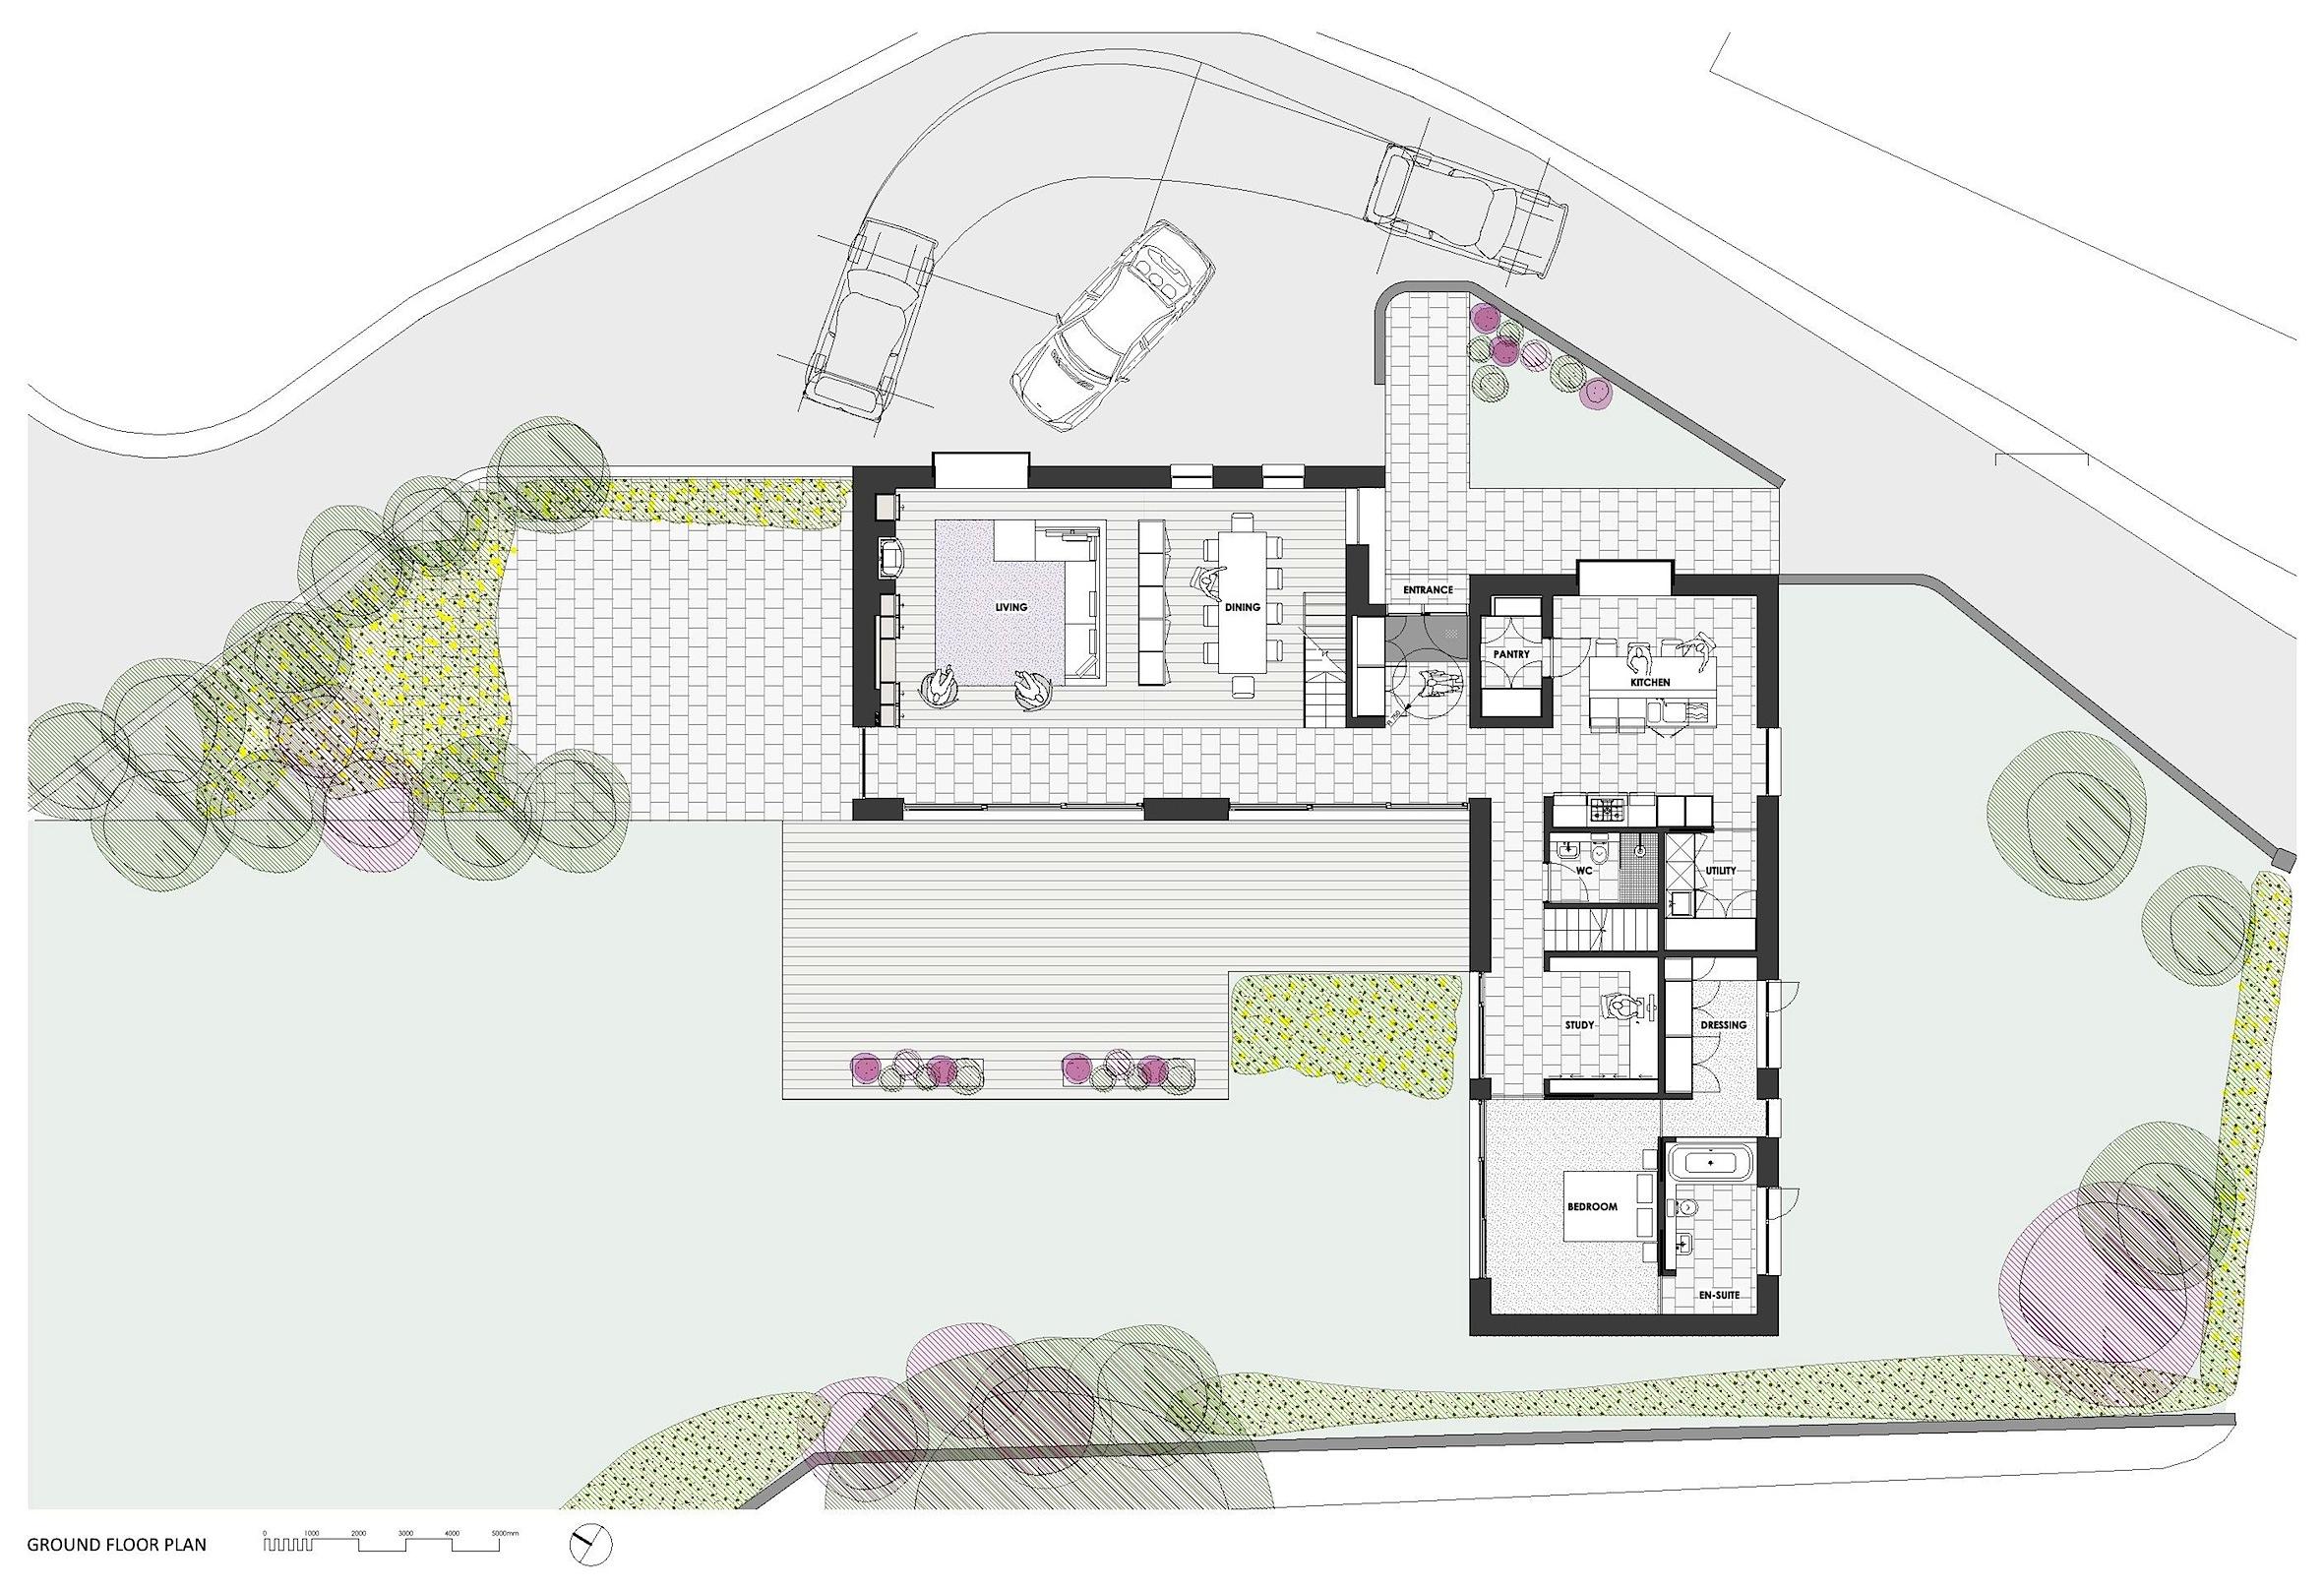 SOUP_K-House_Ground FLOOR PLAN.JPG